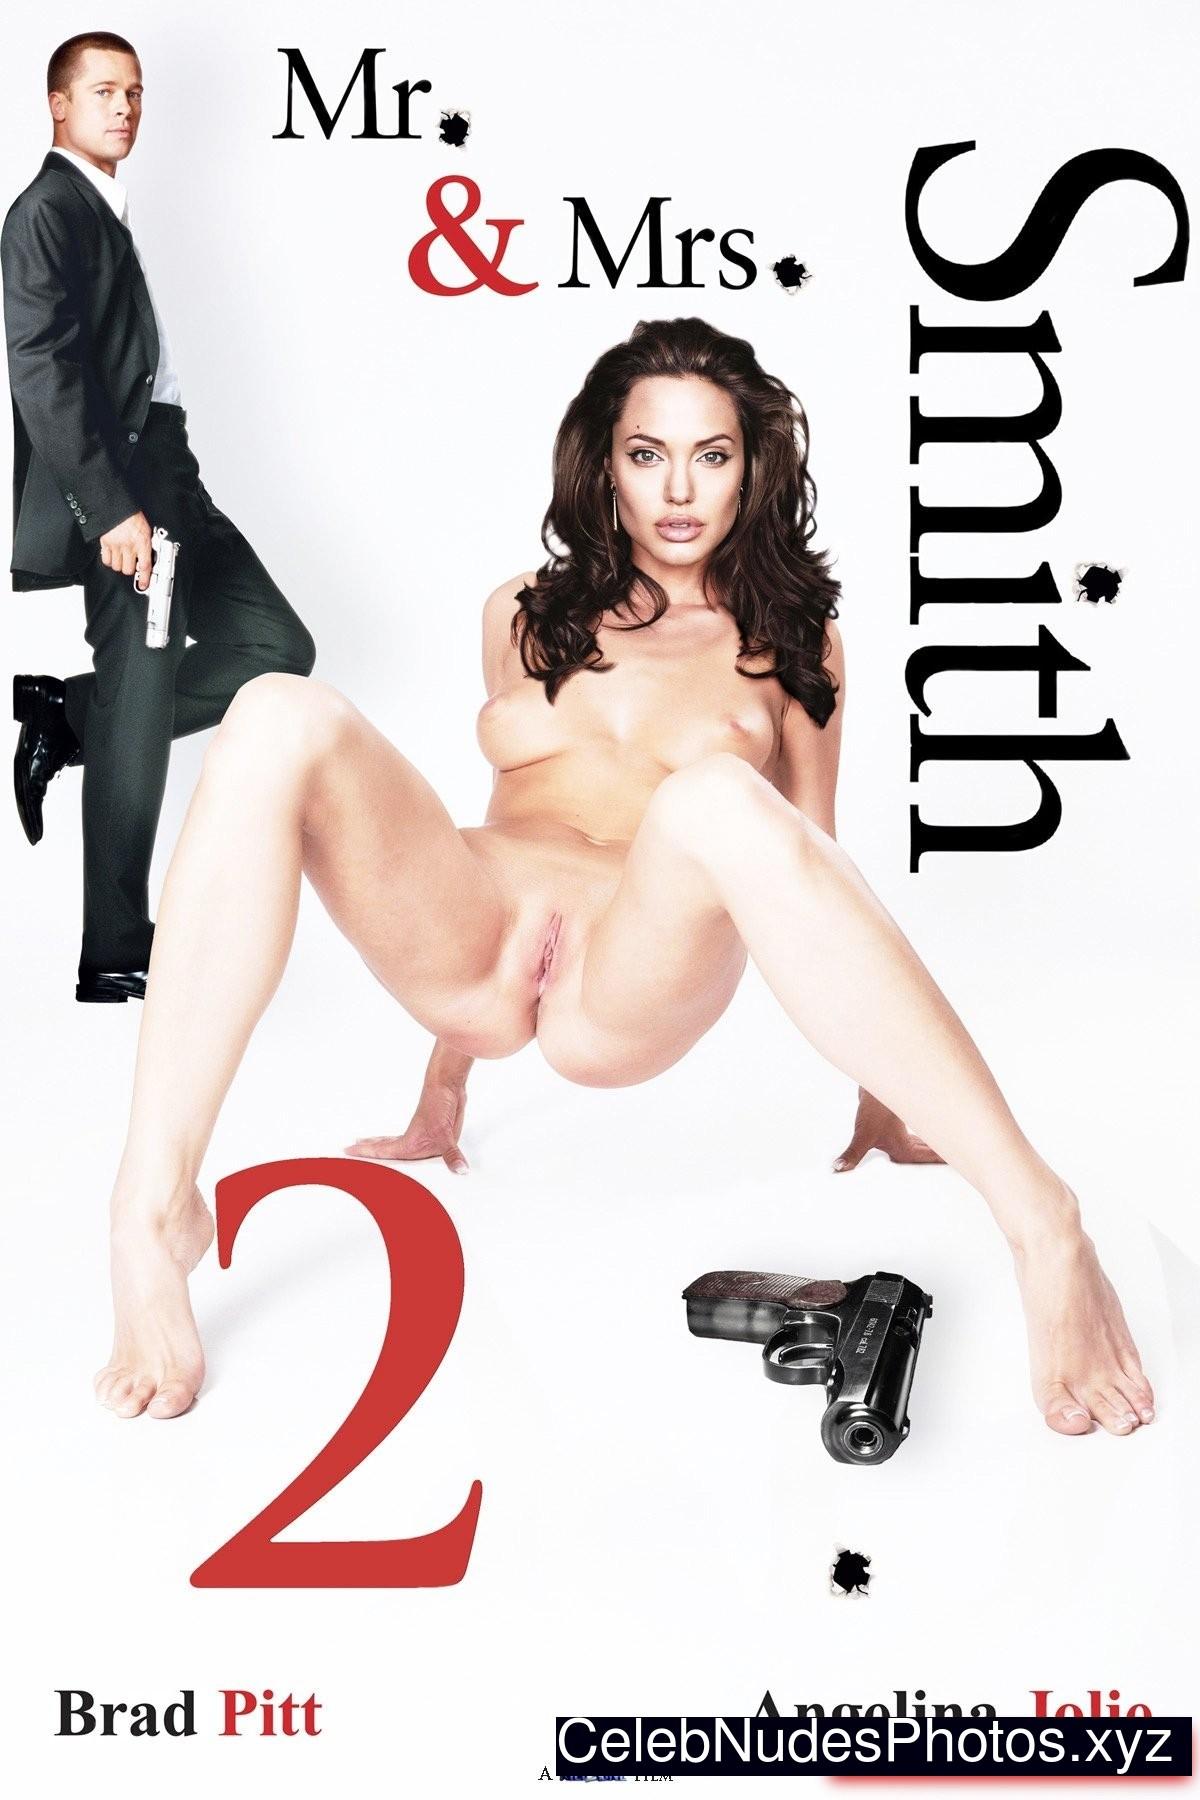 Angelina Jolie Celebrity Leaked Nude Photo sexy 12